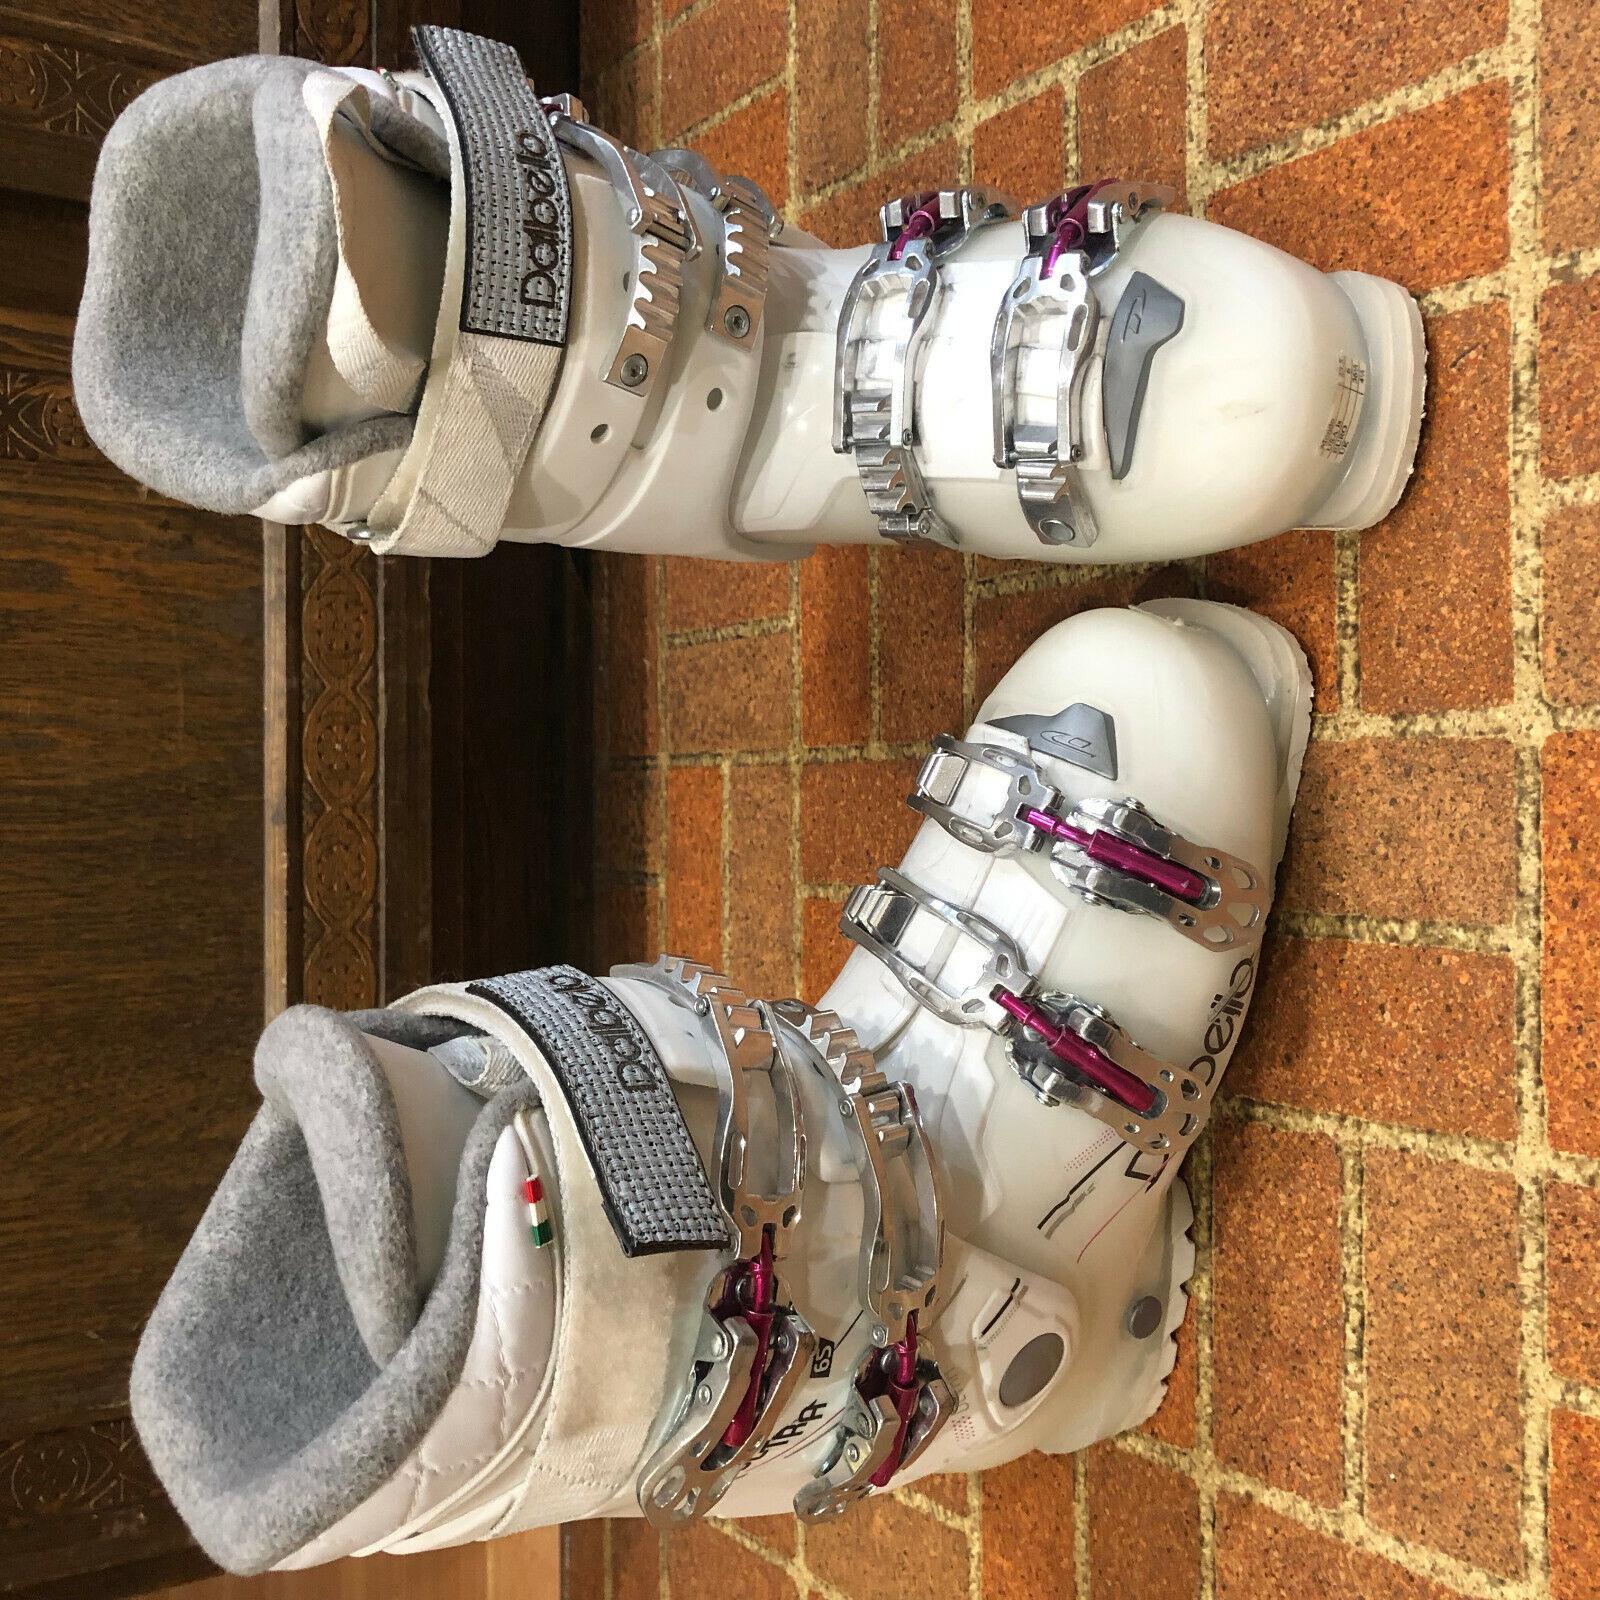 Dalbello Ultra 65 Women's Ski Boots 2017 23.5 US sz 6